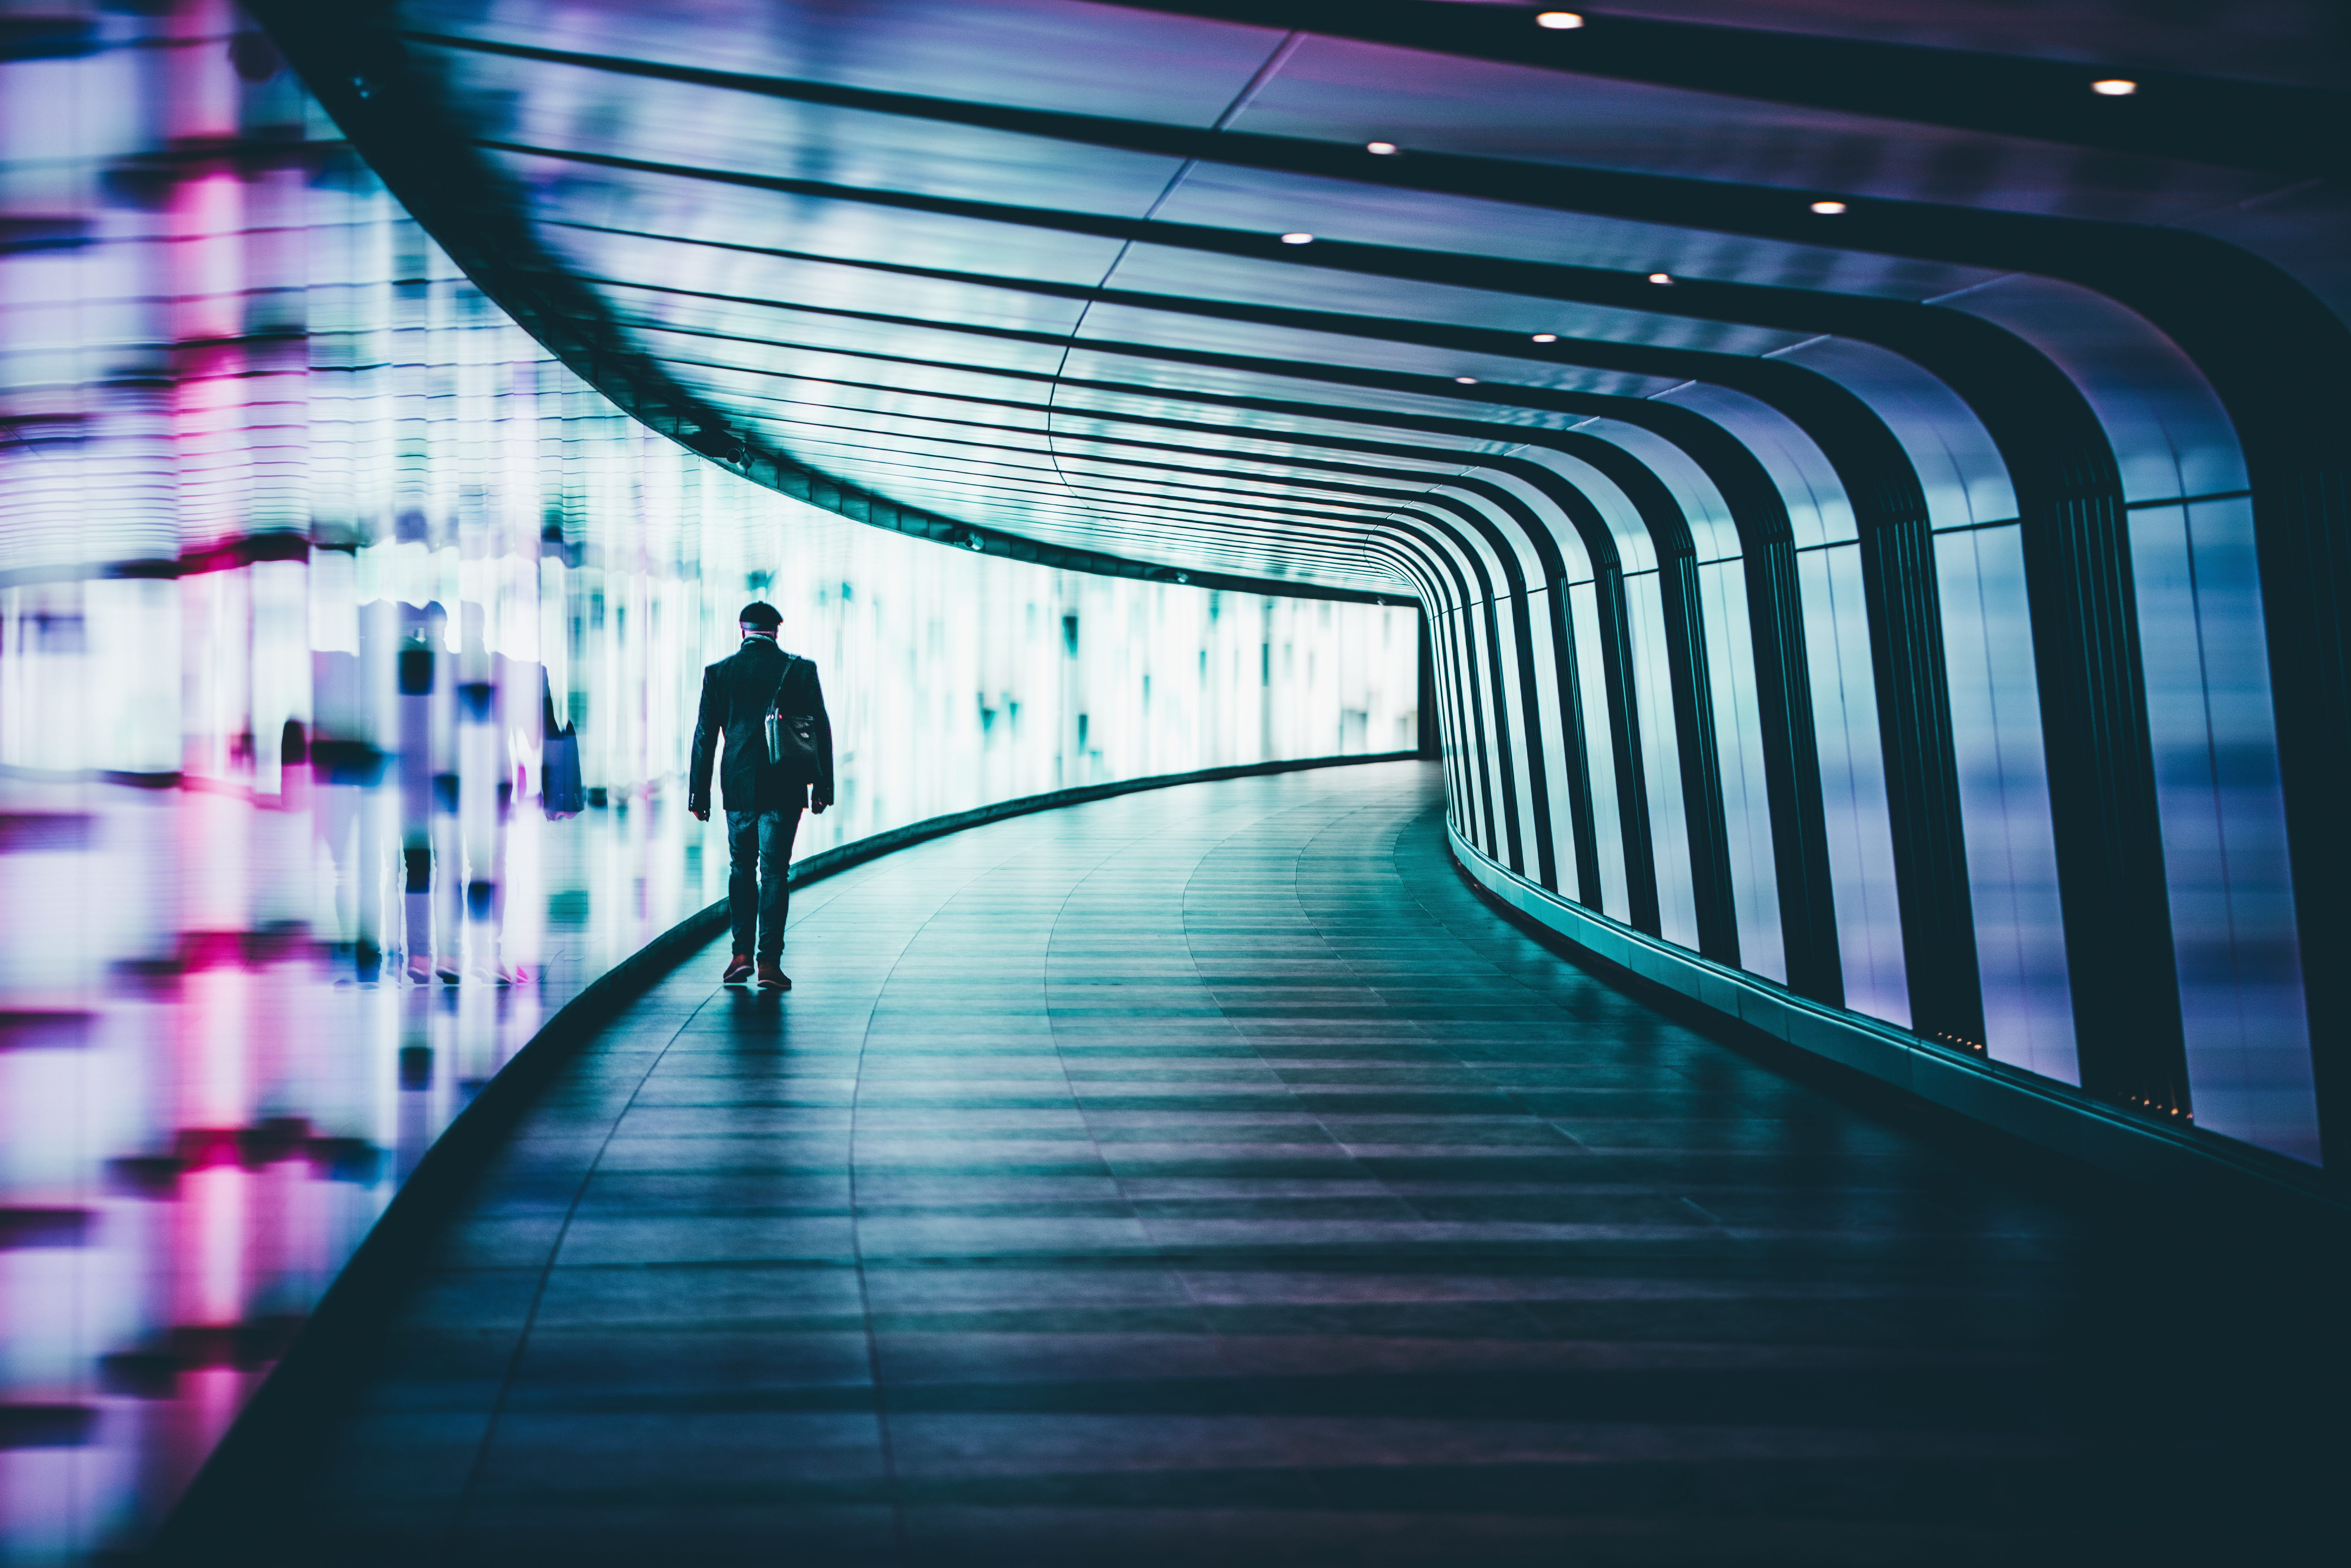 Man-walking-lights-unsplash